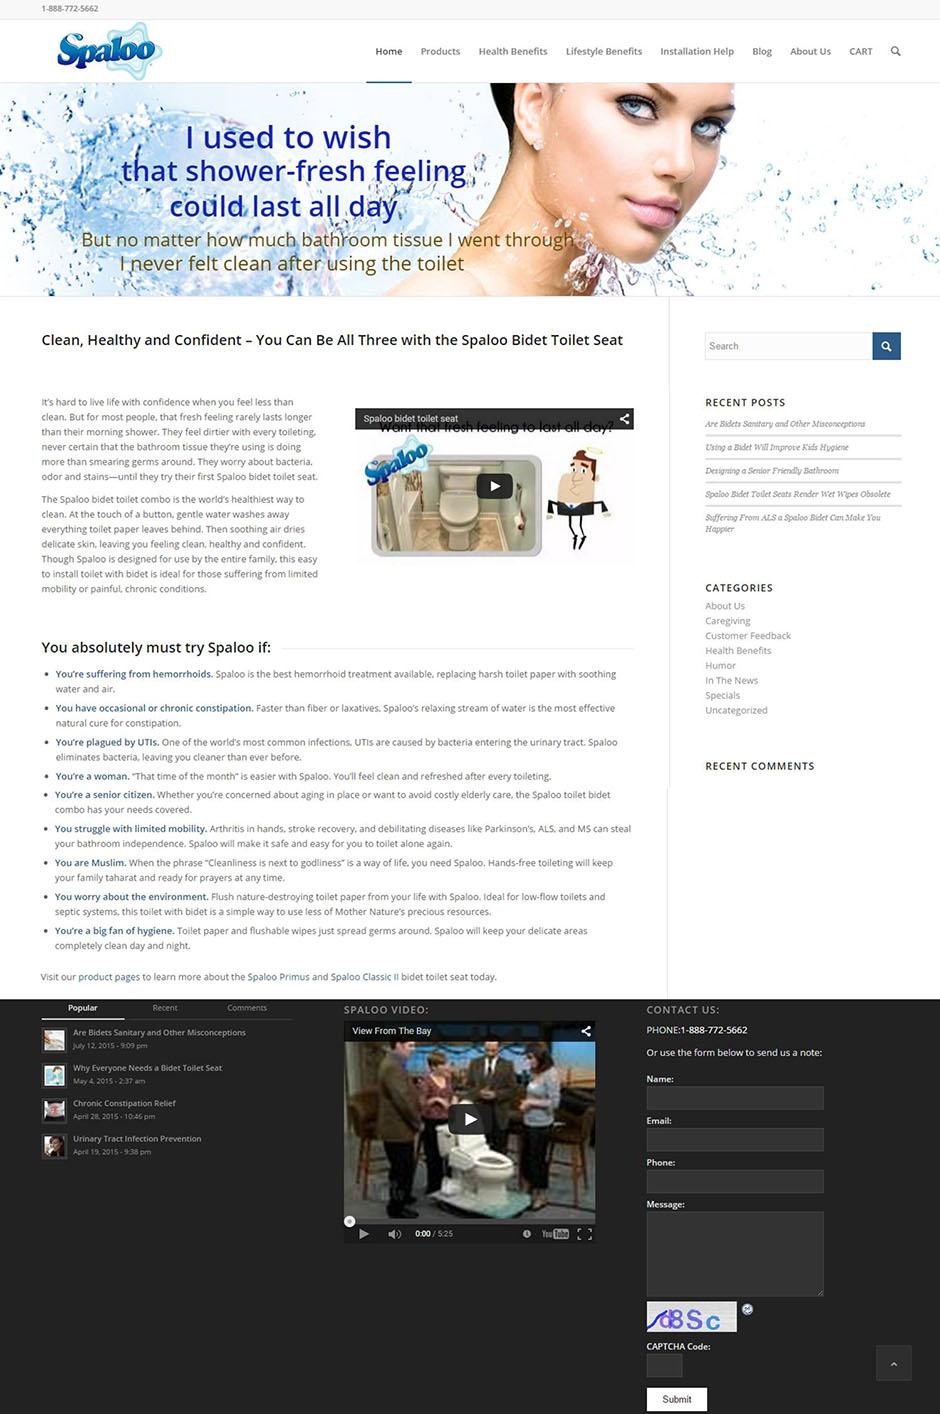 Spaloo Home Page